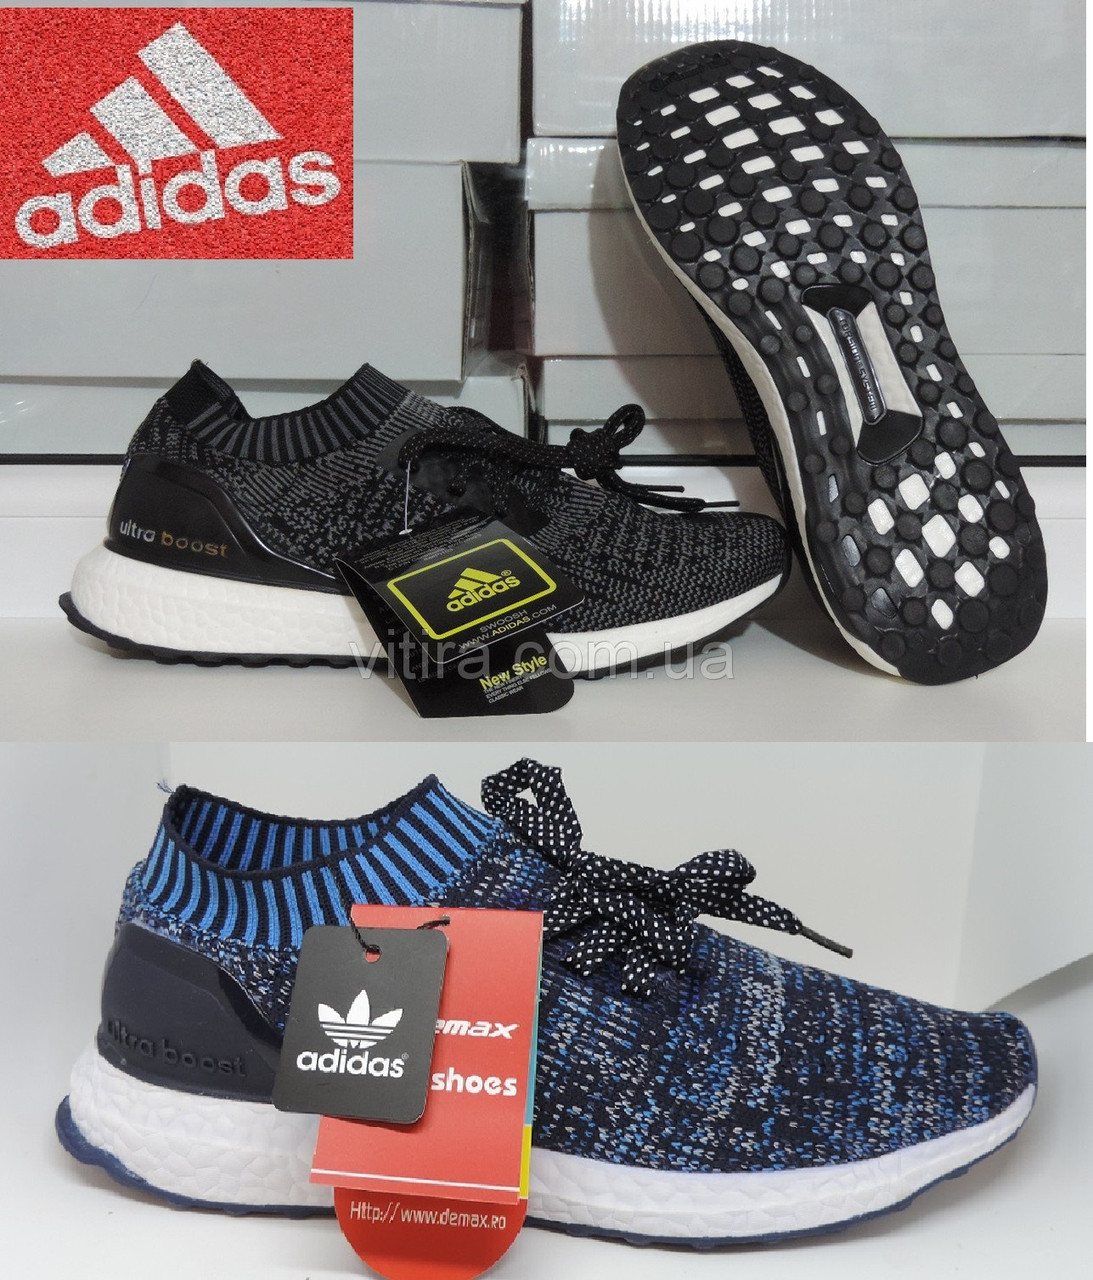 b565bc23 Мужские кроссовки беговые Adidas Ultra Boost Uncaged